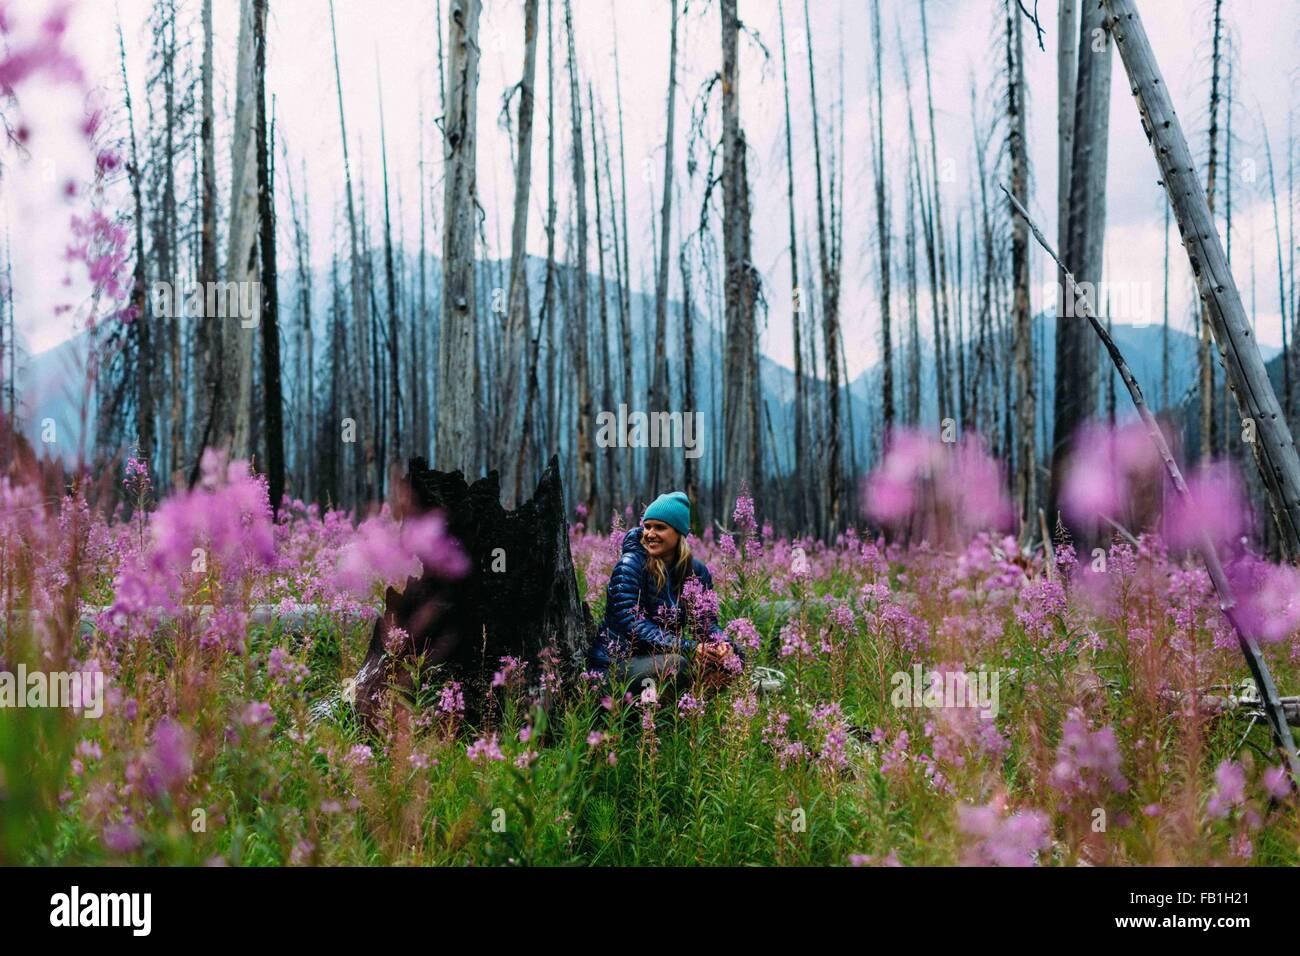 Mid adult woman sitting burnt tree stump field wildflowers away smiling Moraine lake Banff National Park Alberta - Stock Image